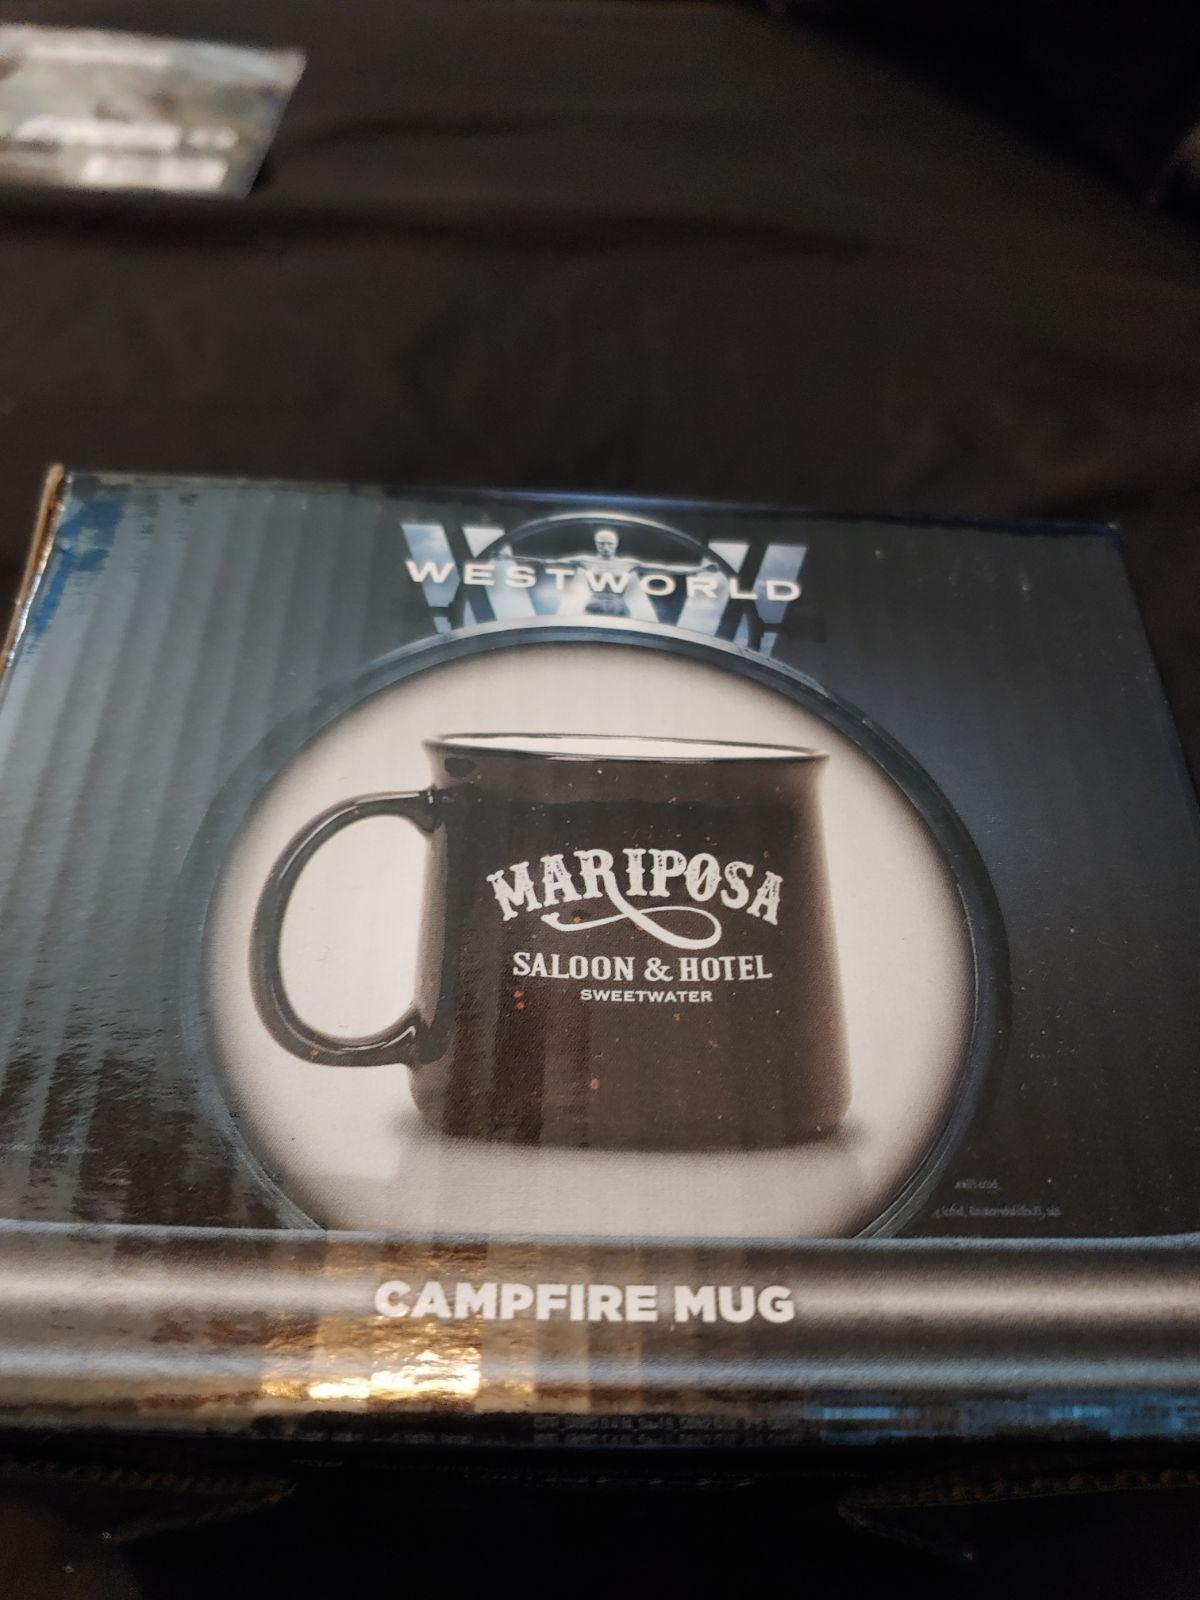 Loot Crate Westworld Mariposa Mug MIB